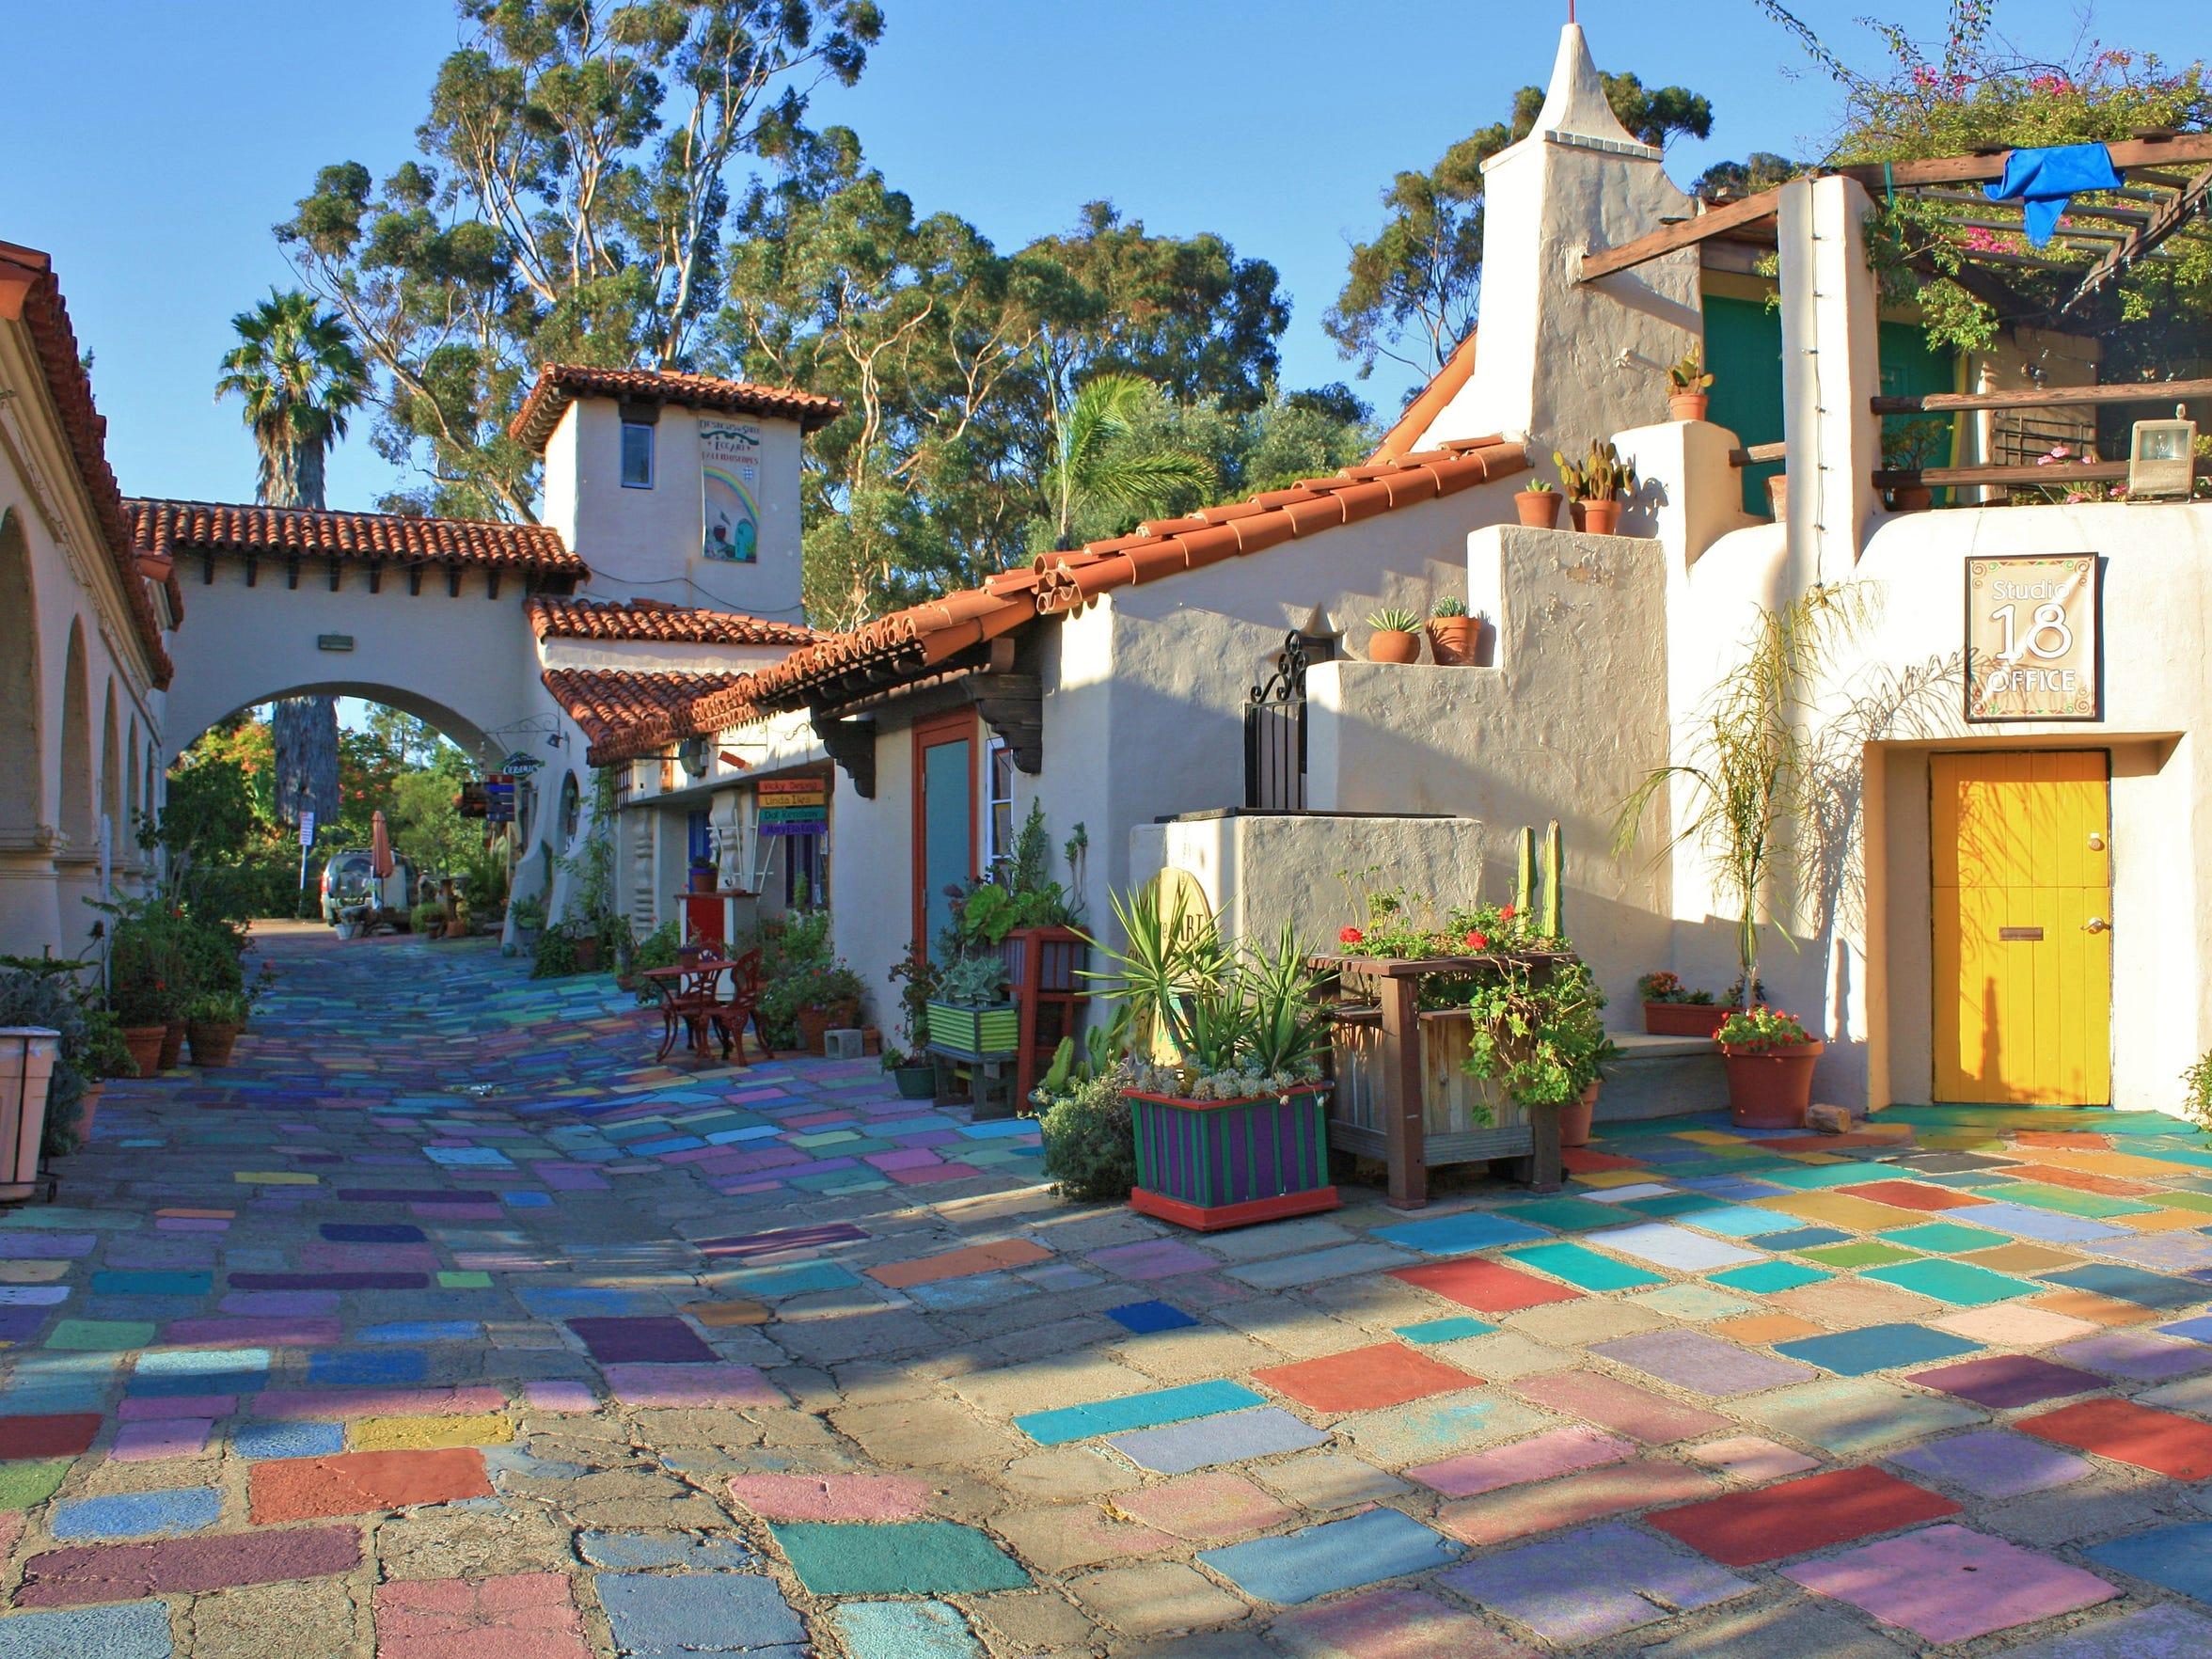 Spanish Art Village